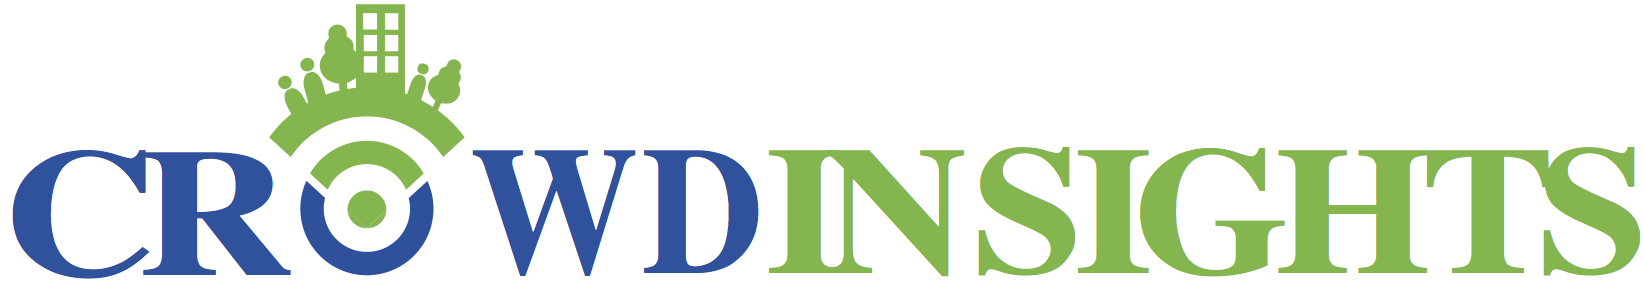 Crowdinsights Logo